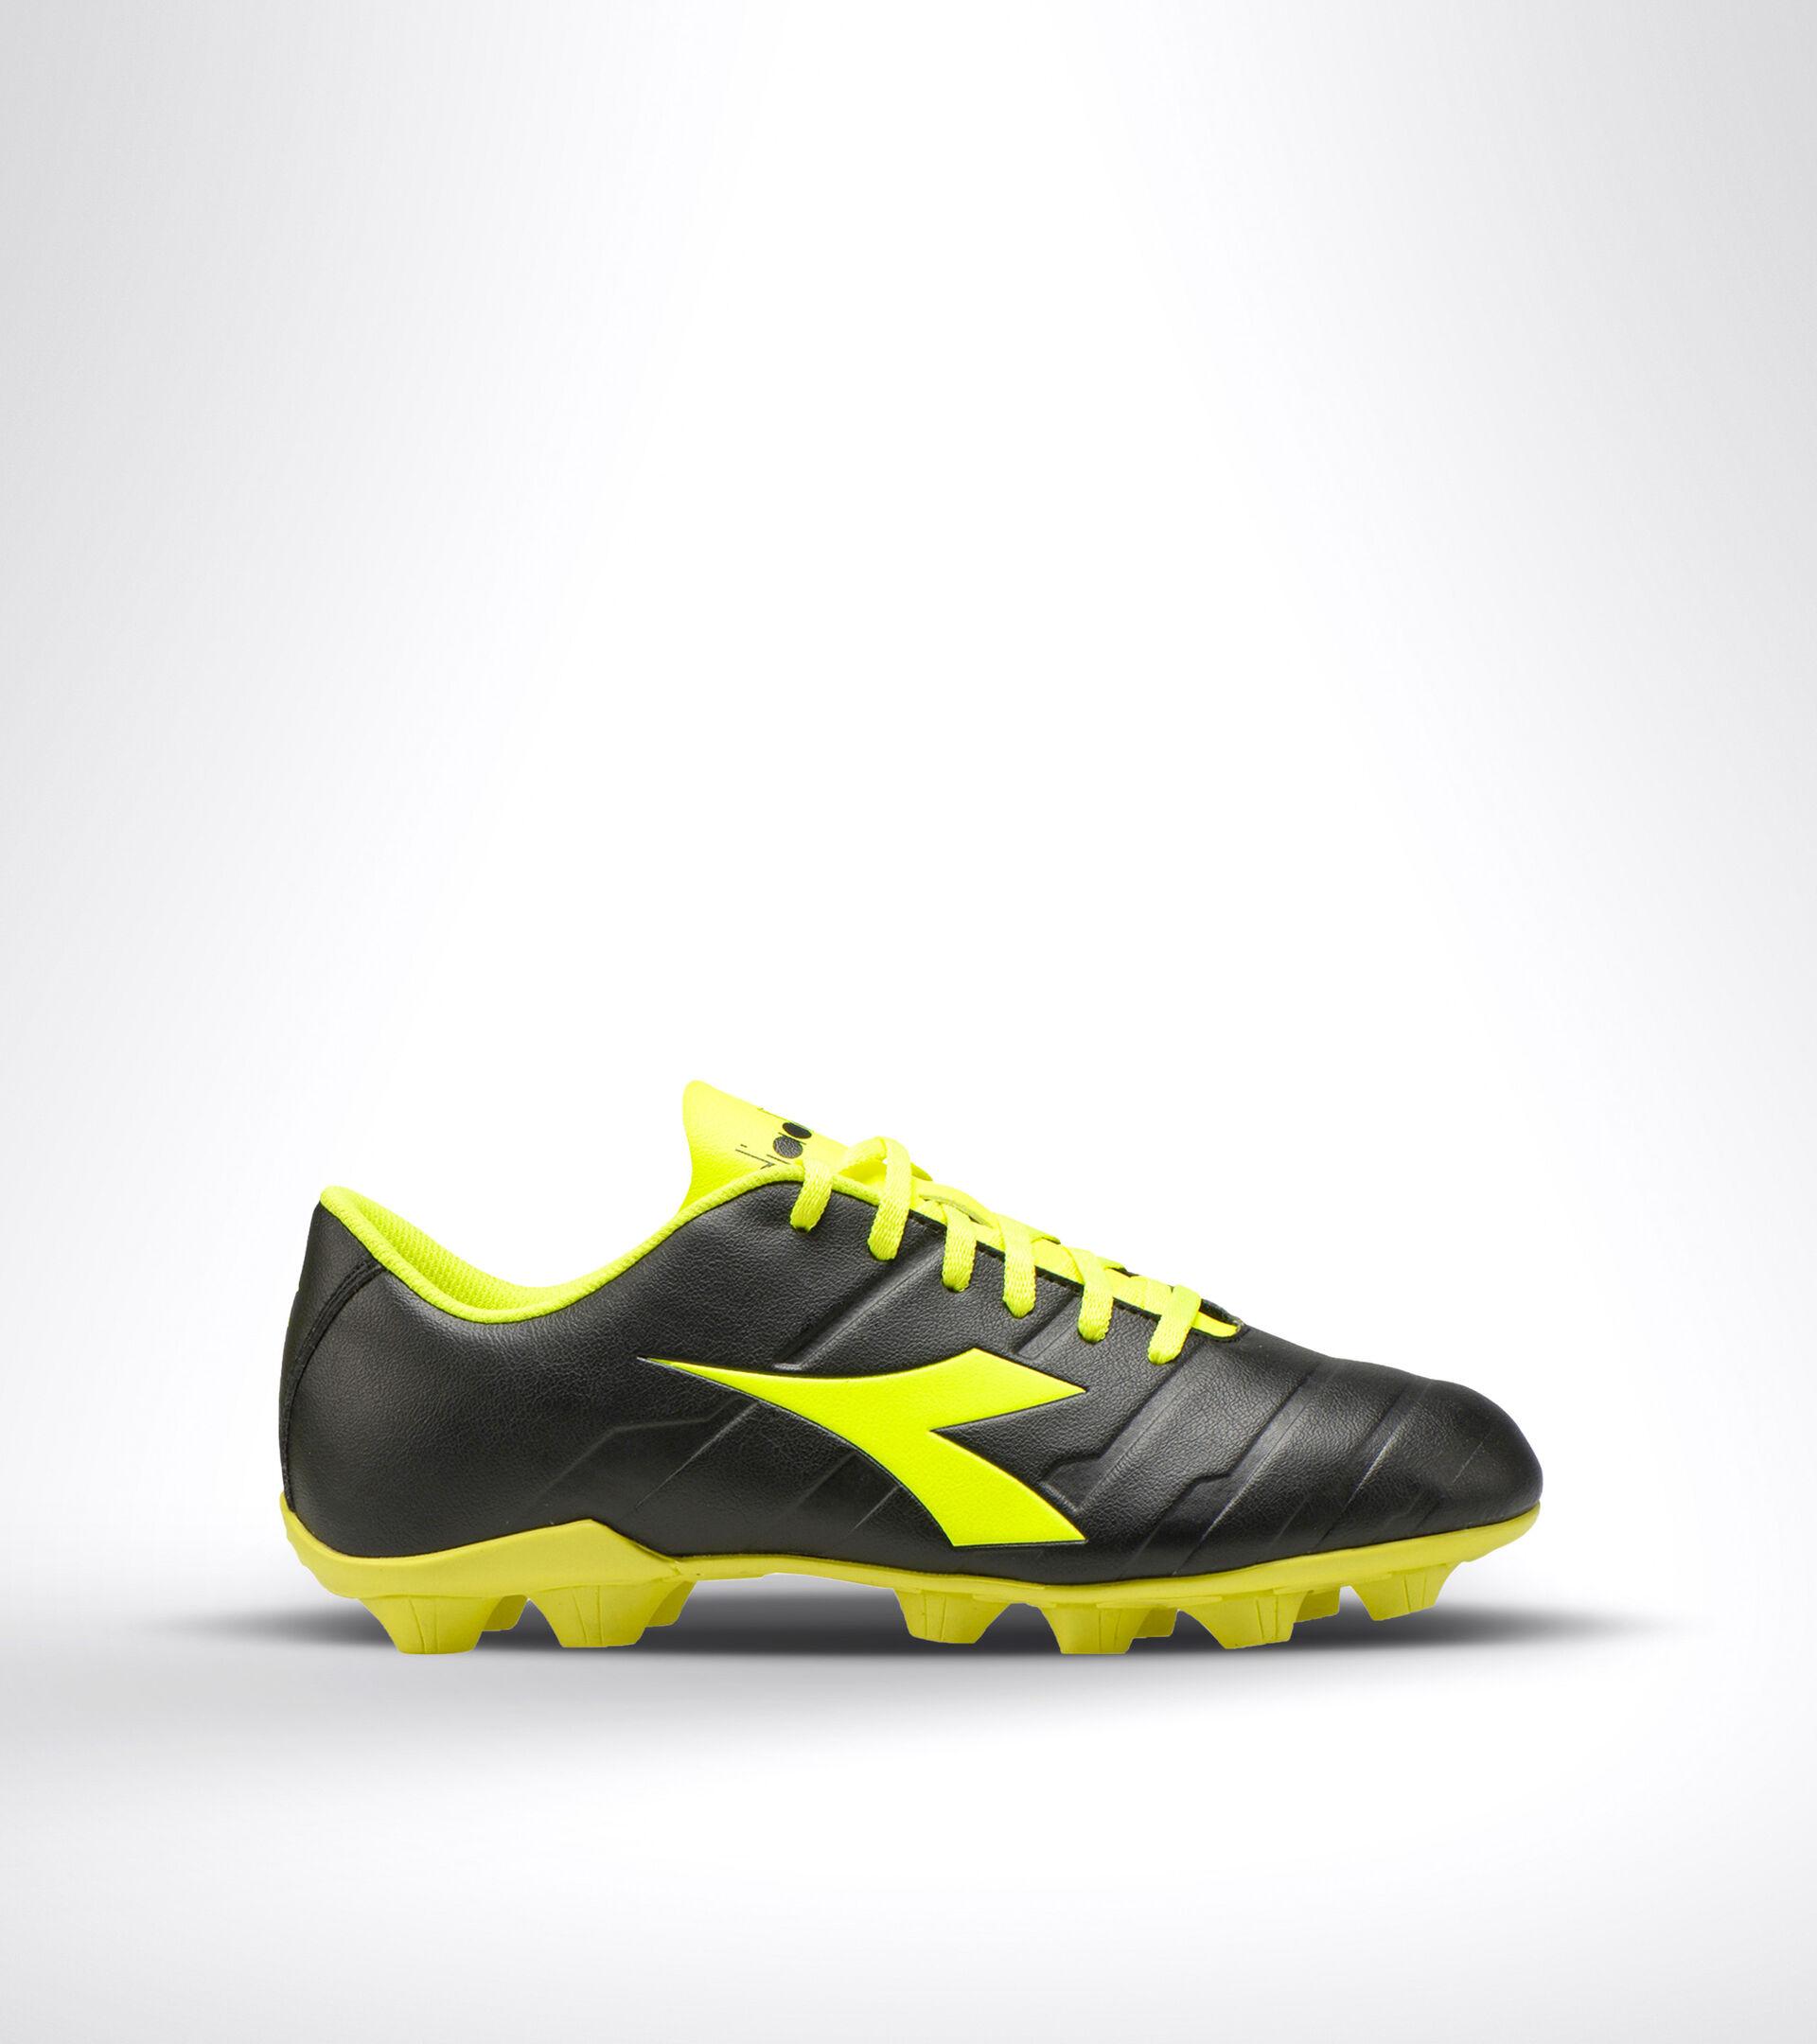 Footwear Sport UOMO PICHICHI 3 MD NEGRO/AMARILLO FLUO DD Diadora